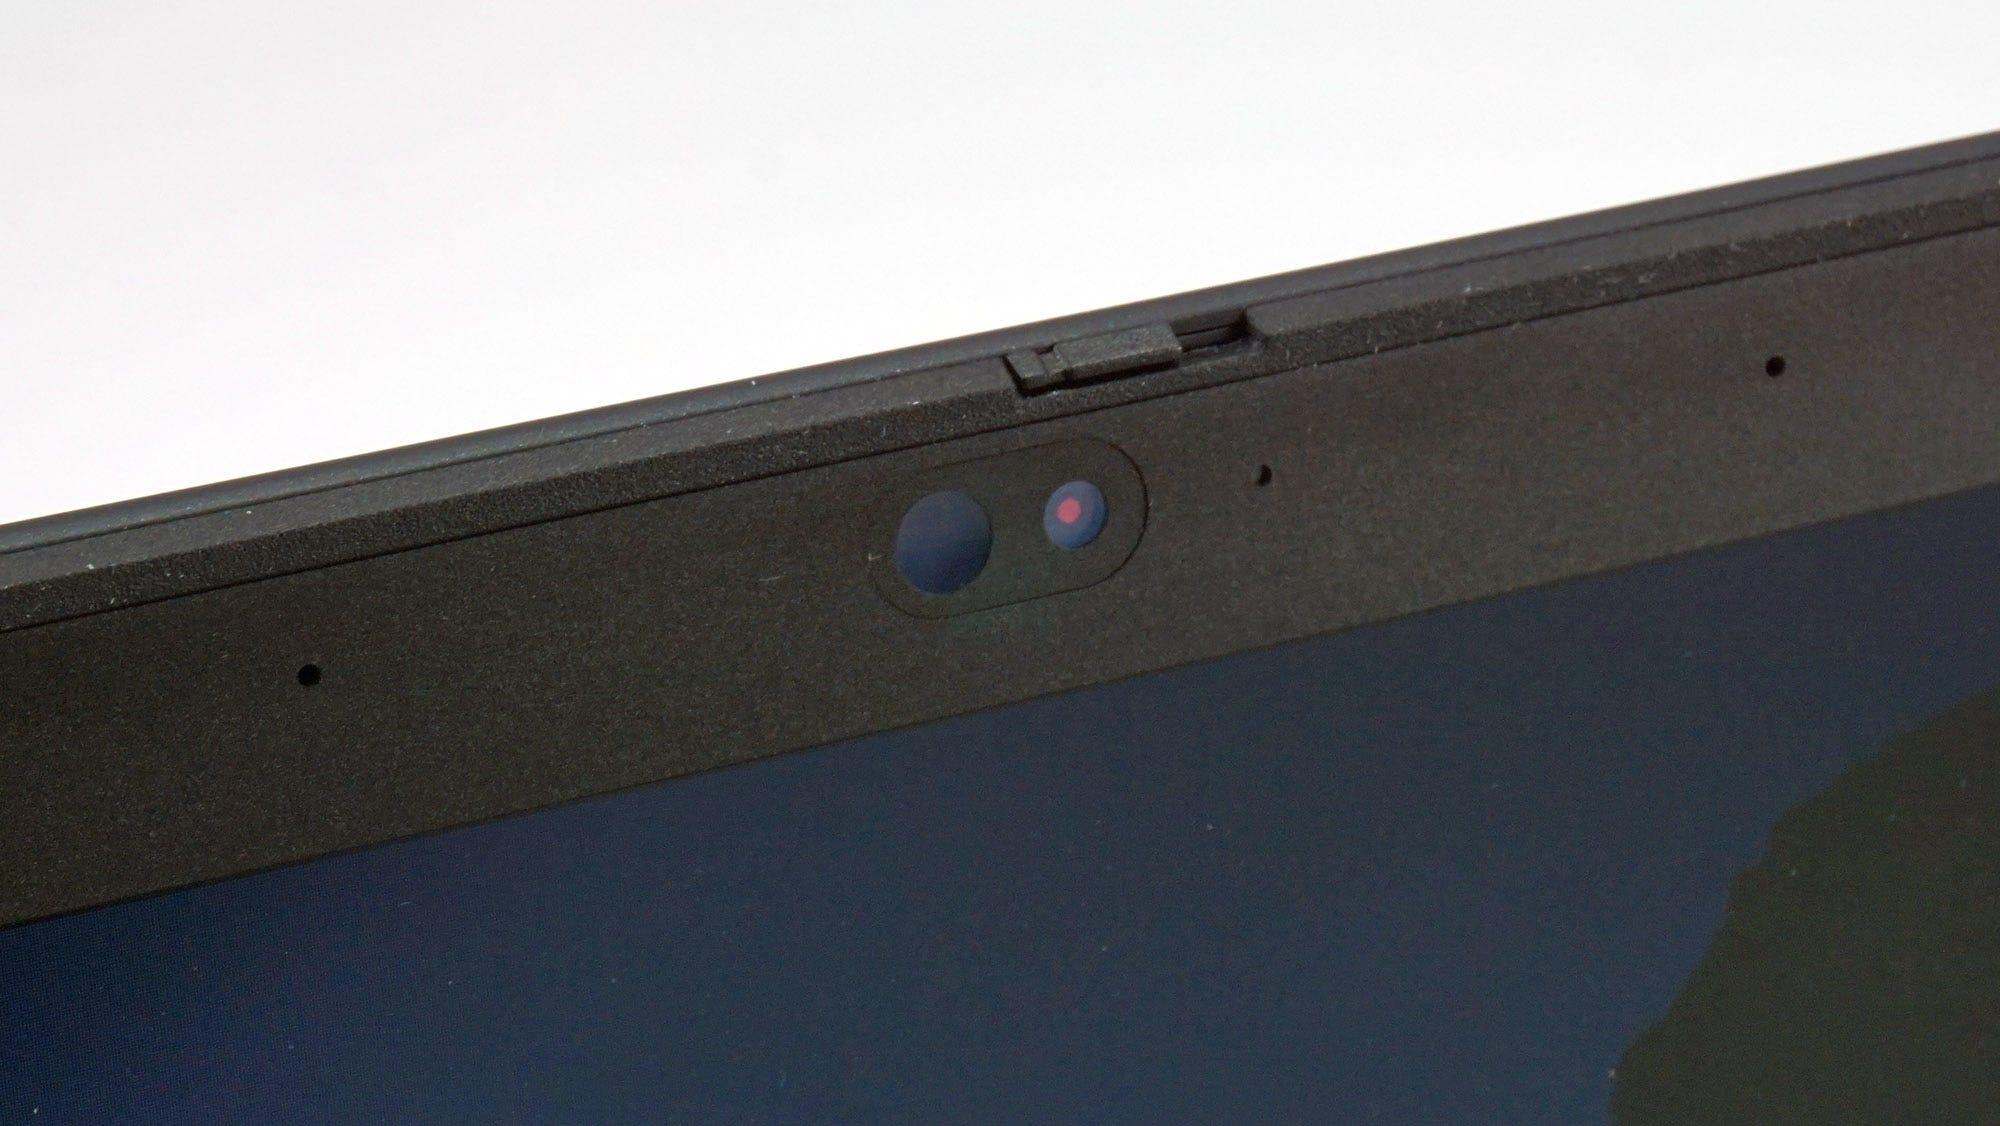 The webcam on the Lenovo T490s.